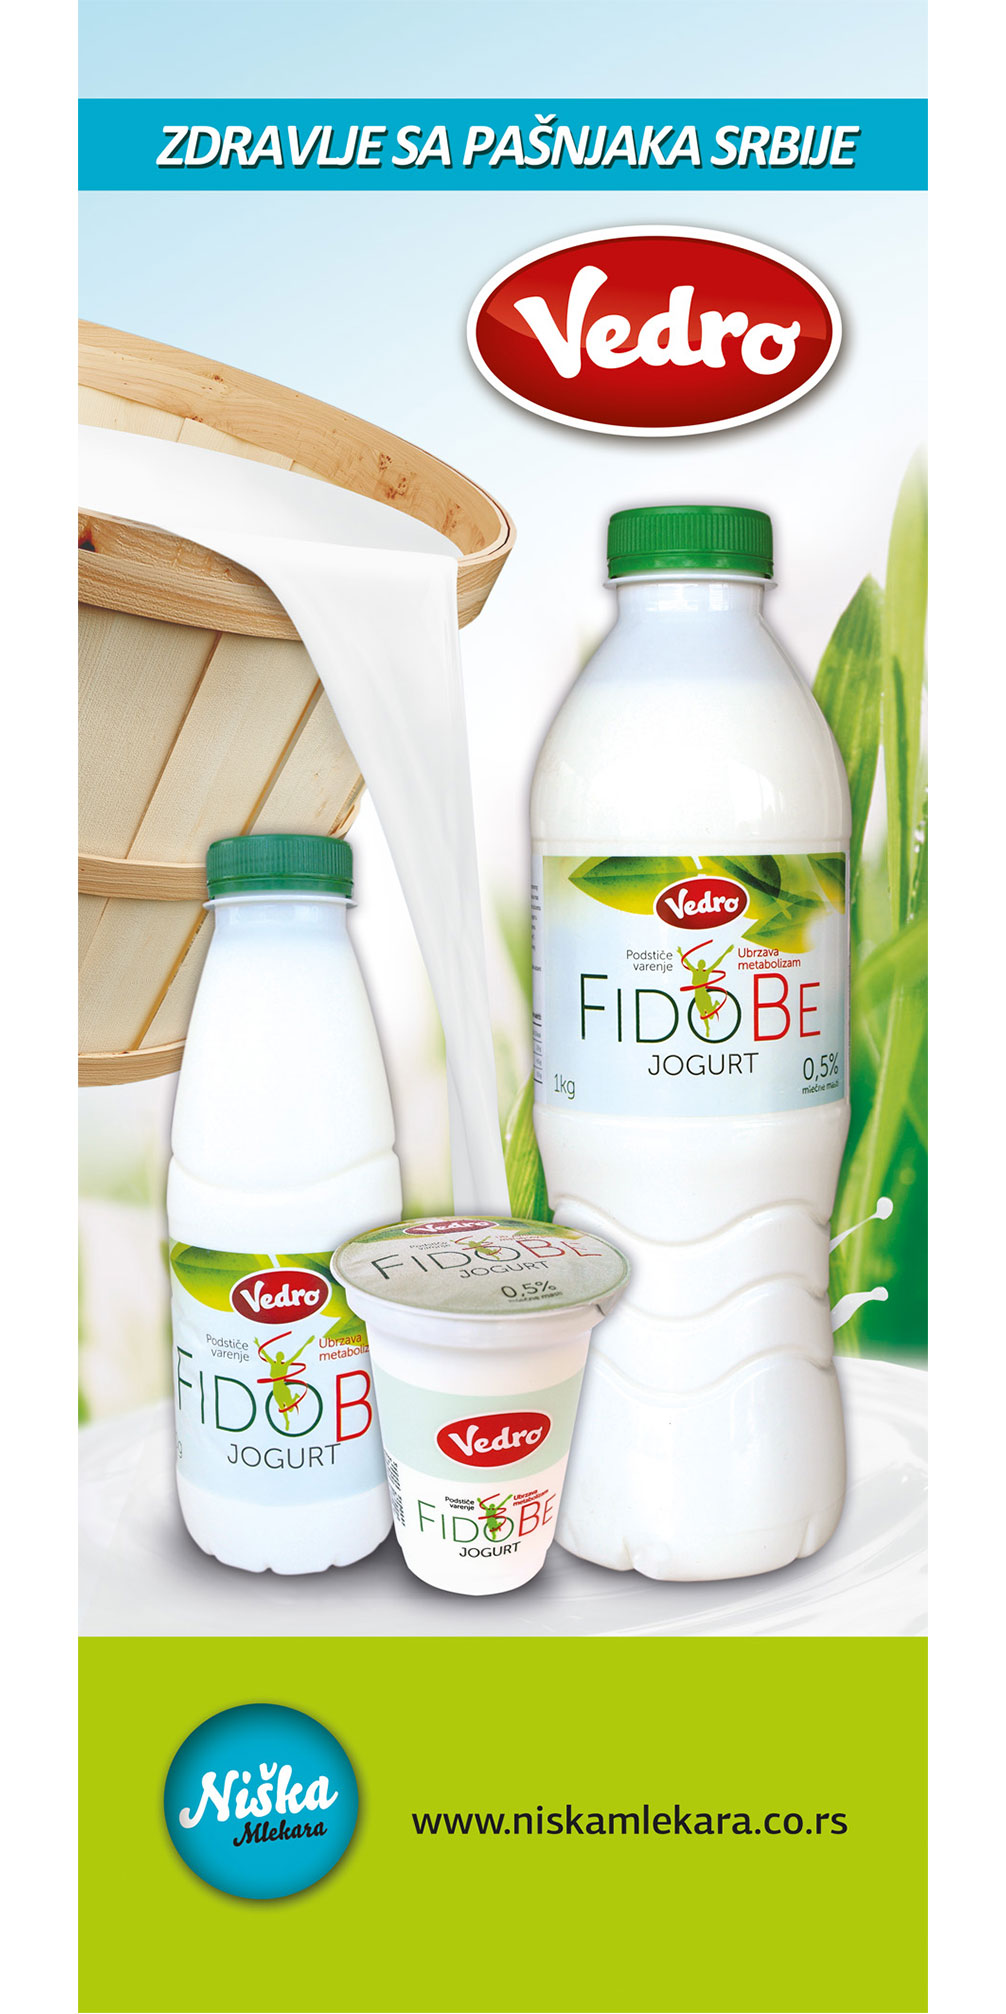 niska mlekara poster 4